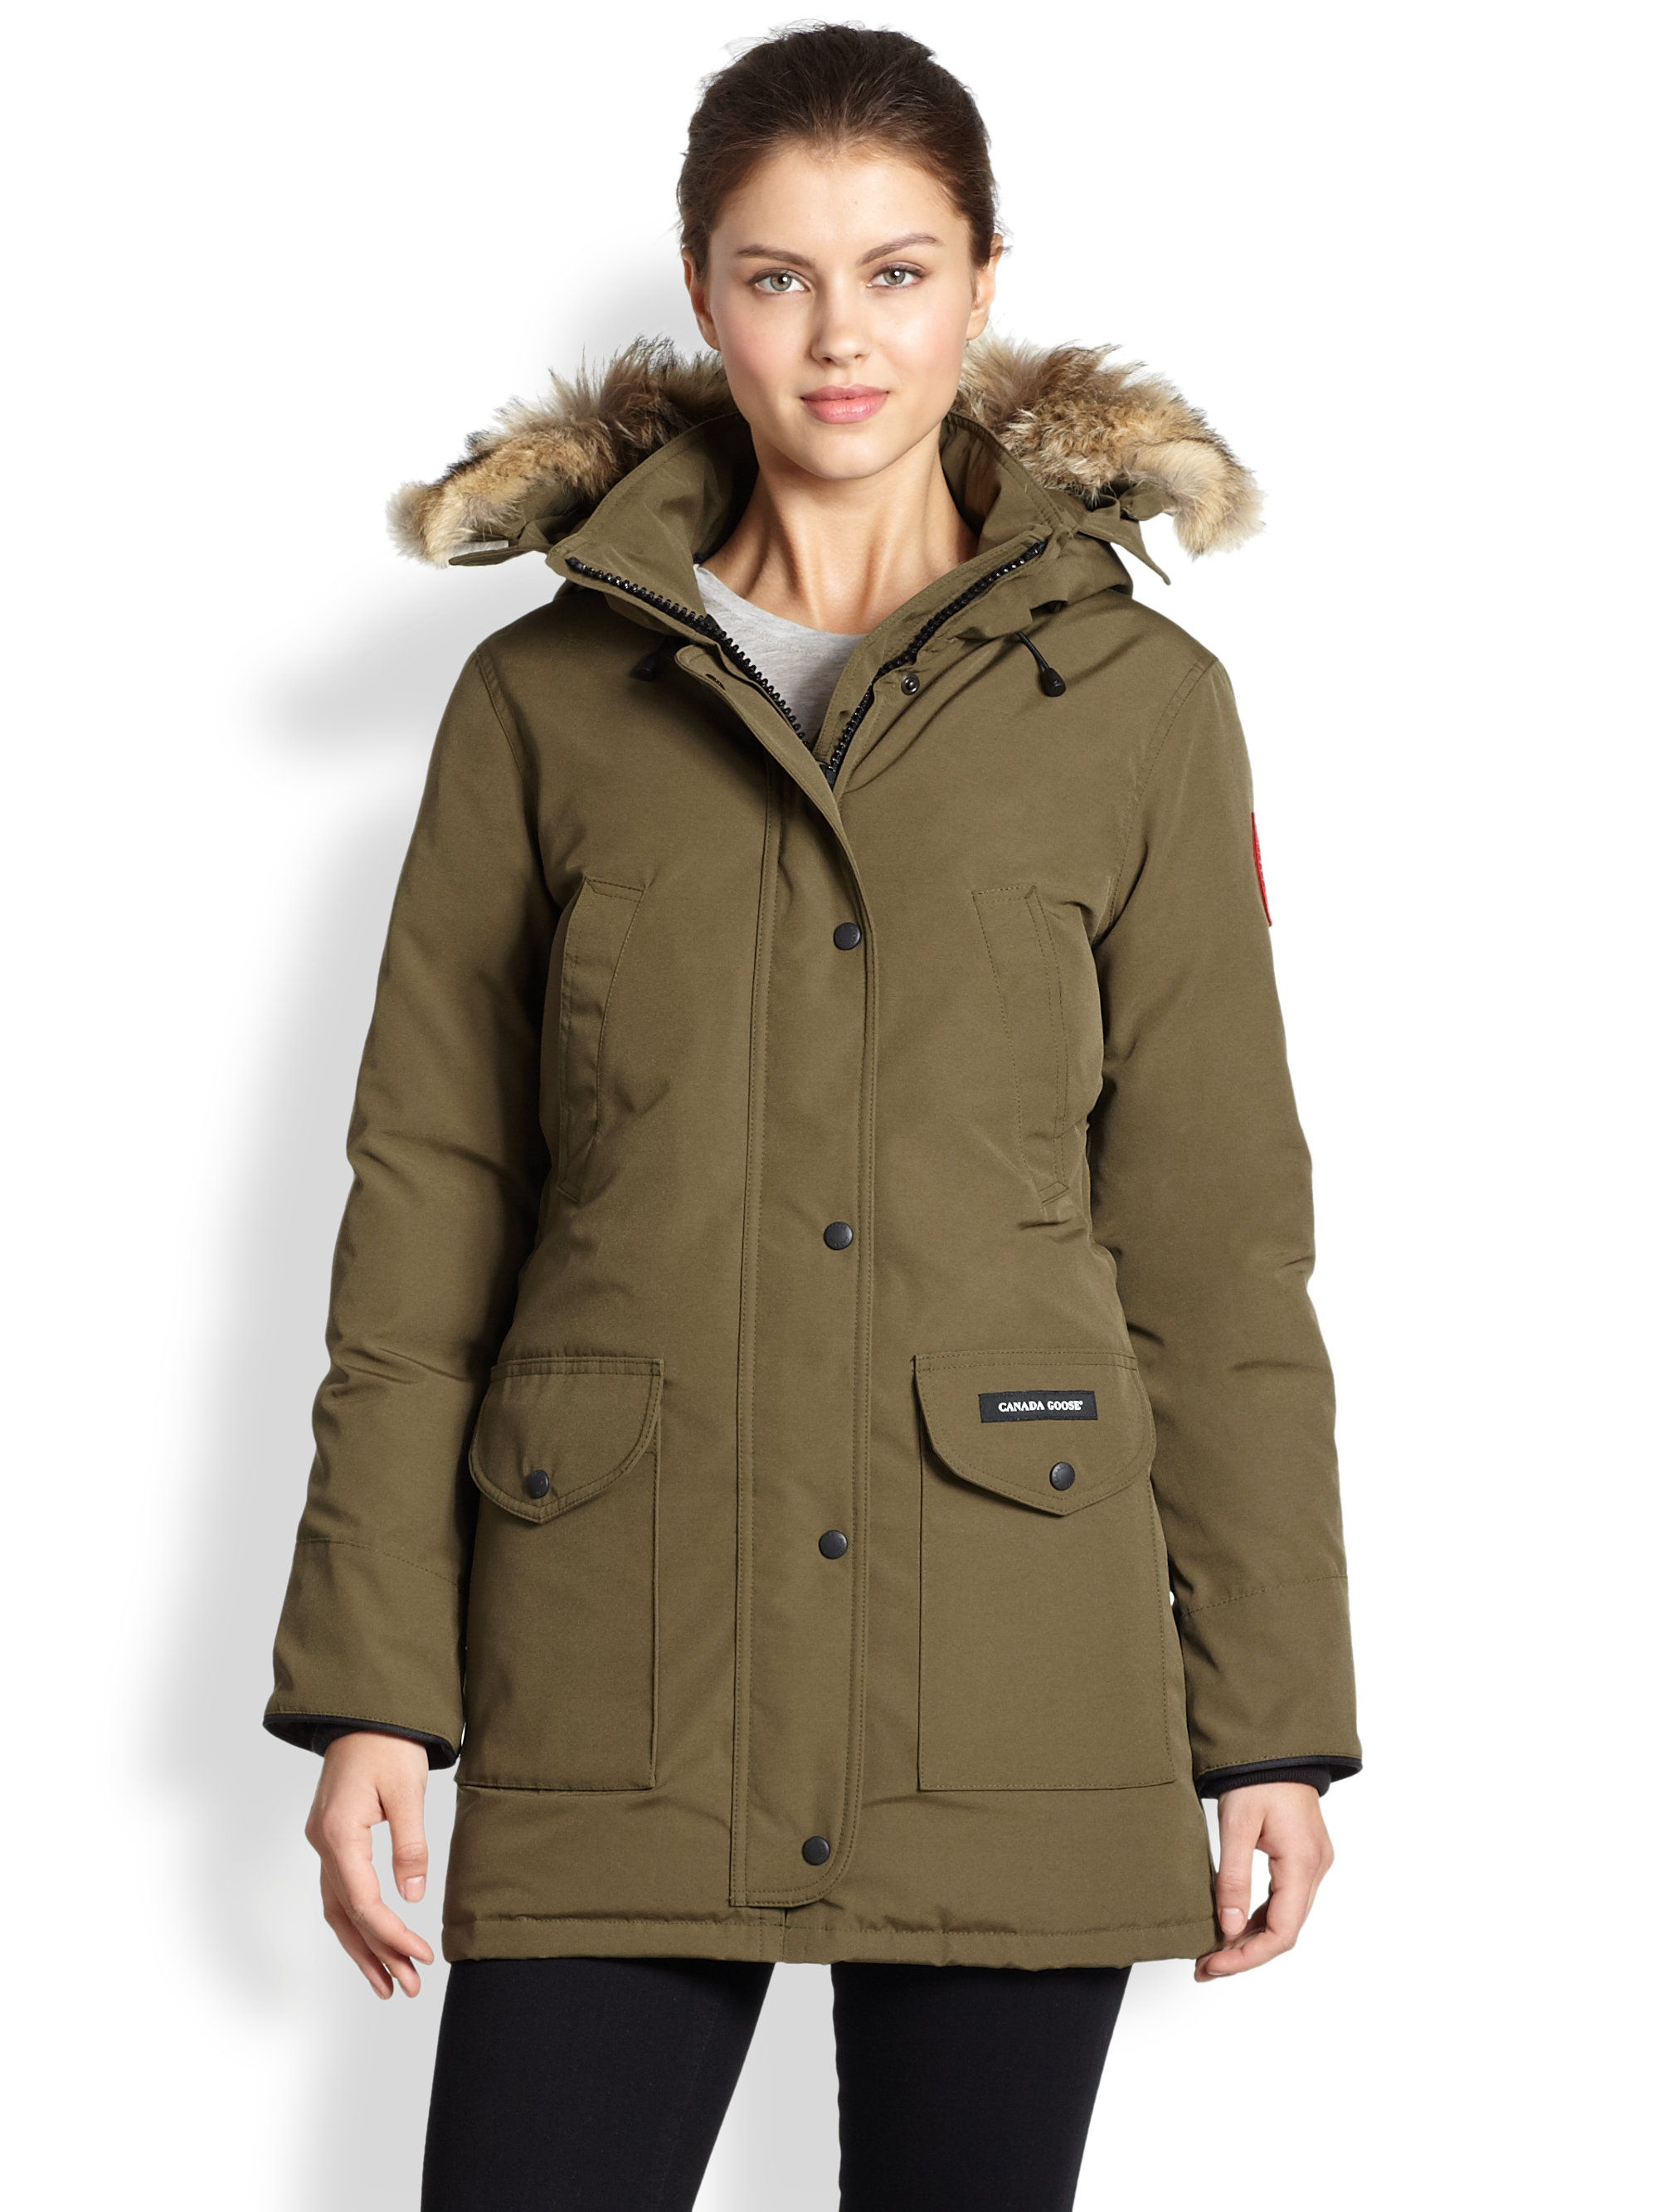 Canada Goose - Trillium Down Parka - Women's - Military Green